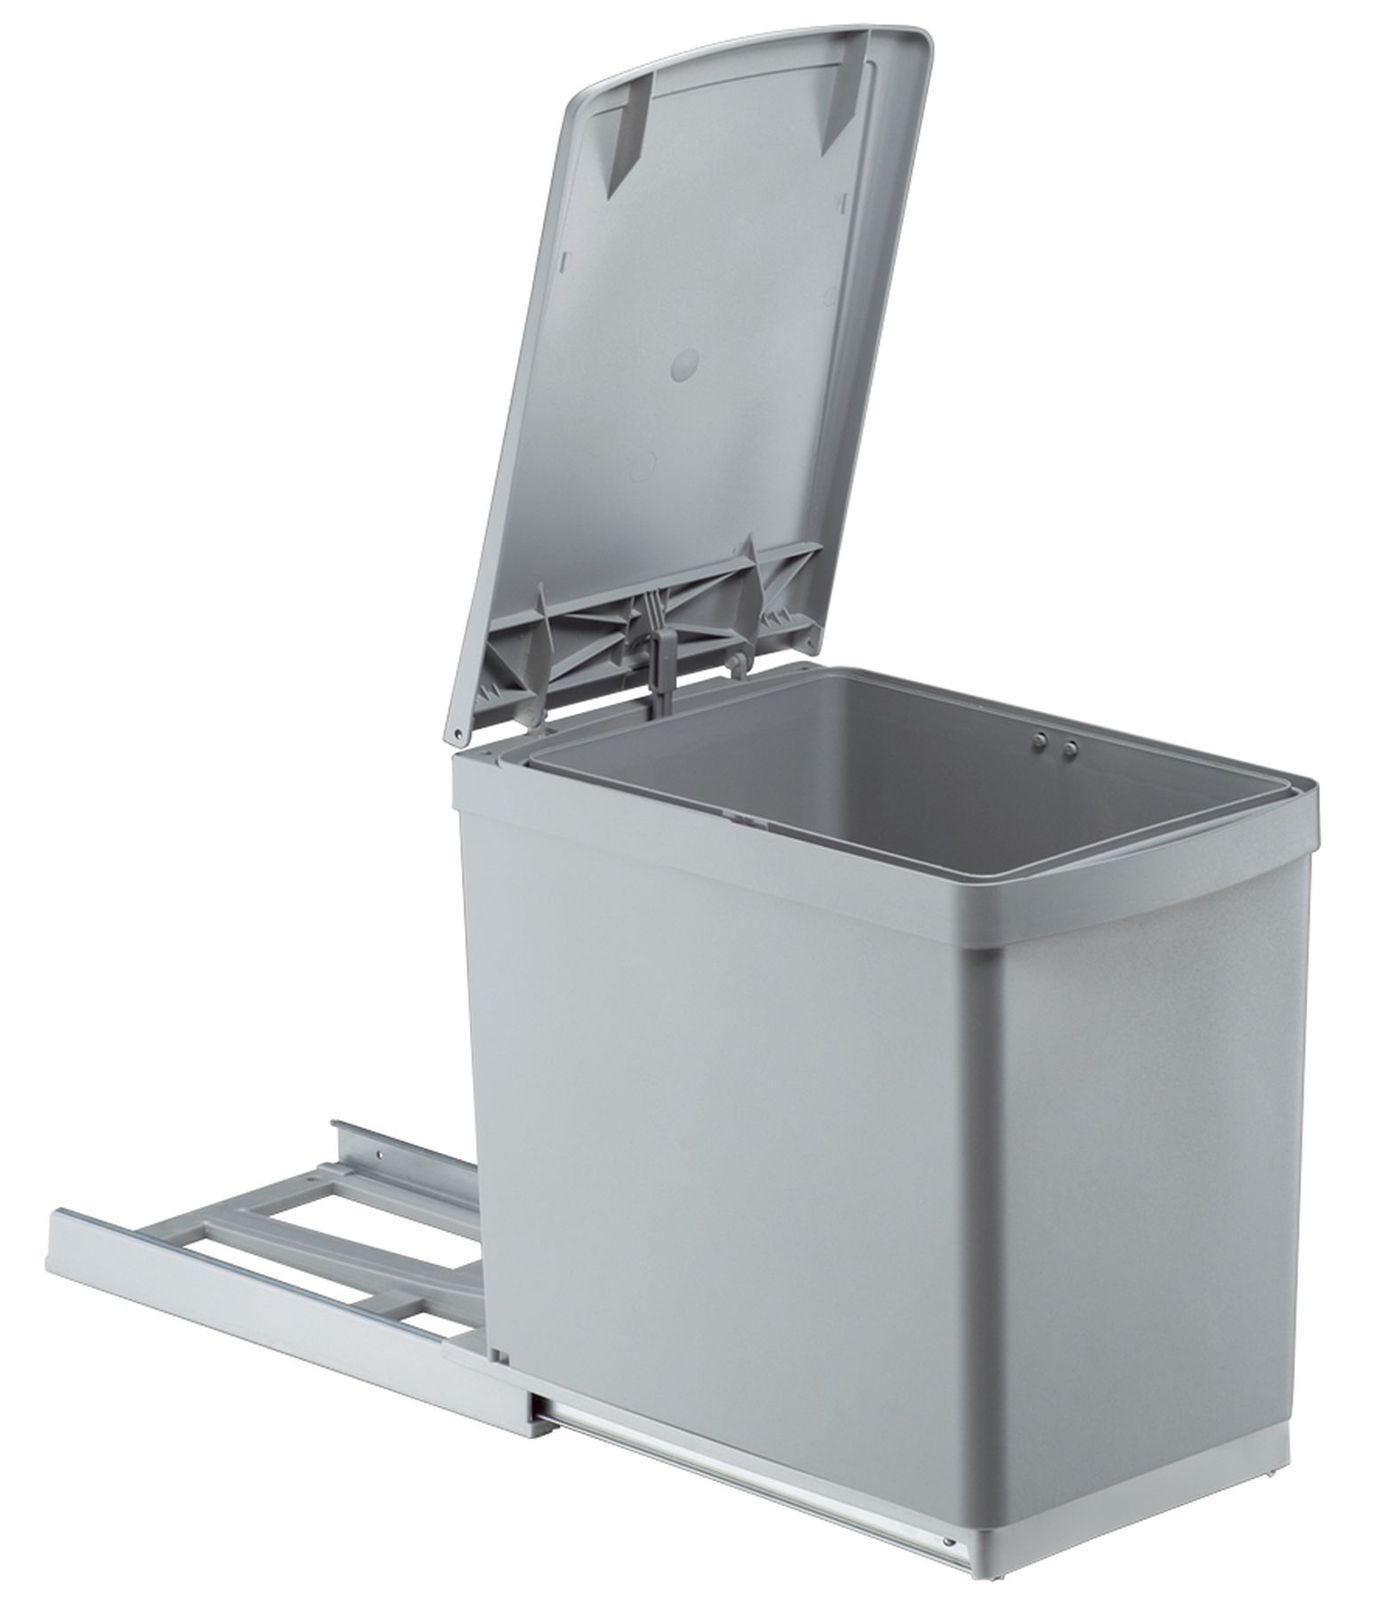 Wesco Küchen Abfall Mülleimer 1 x 16 Liter Vollauszug ab 30 cm ...